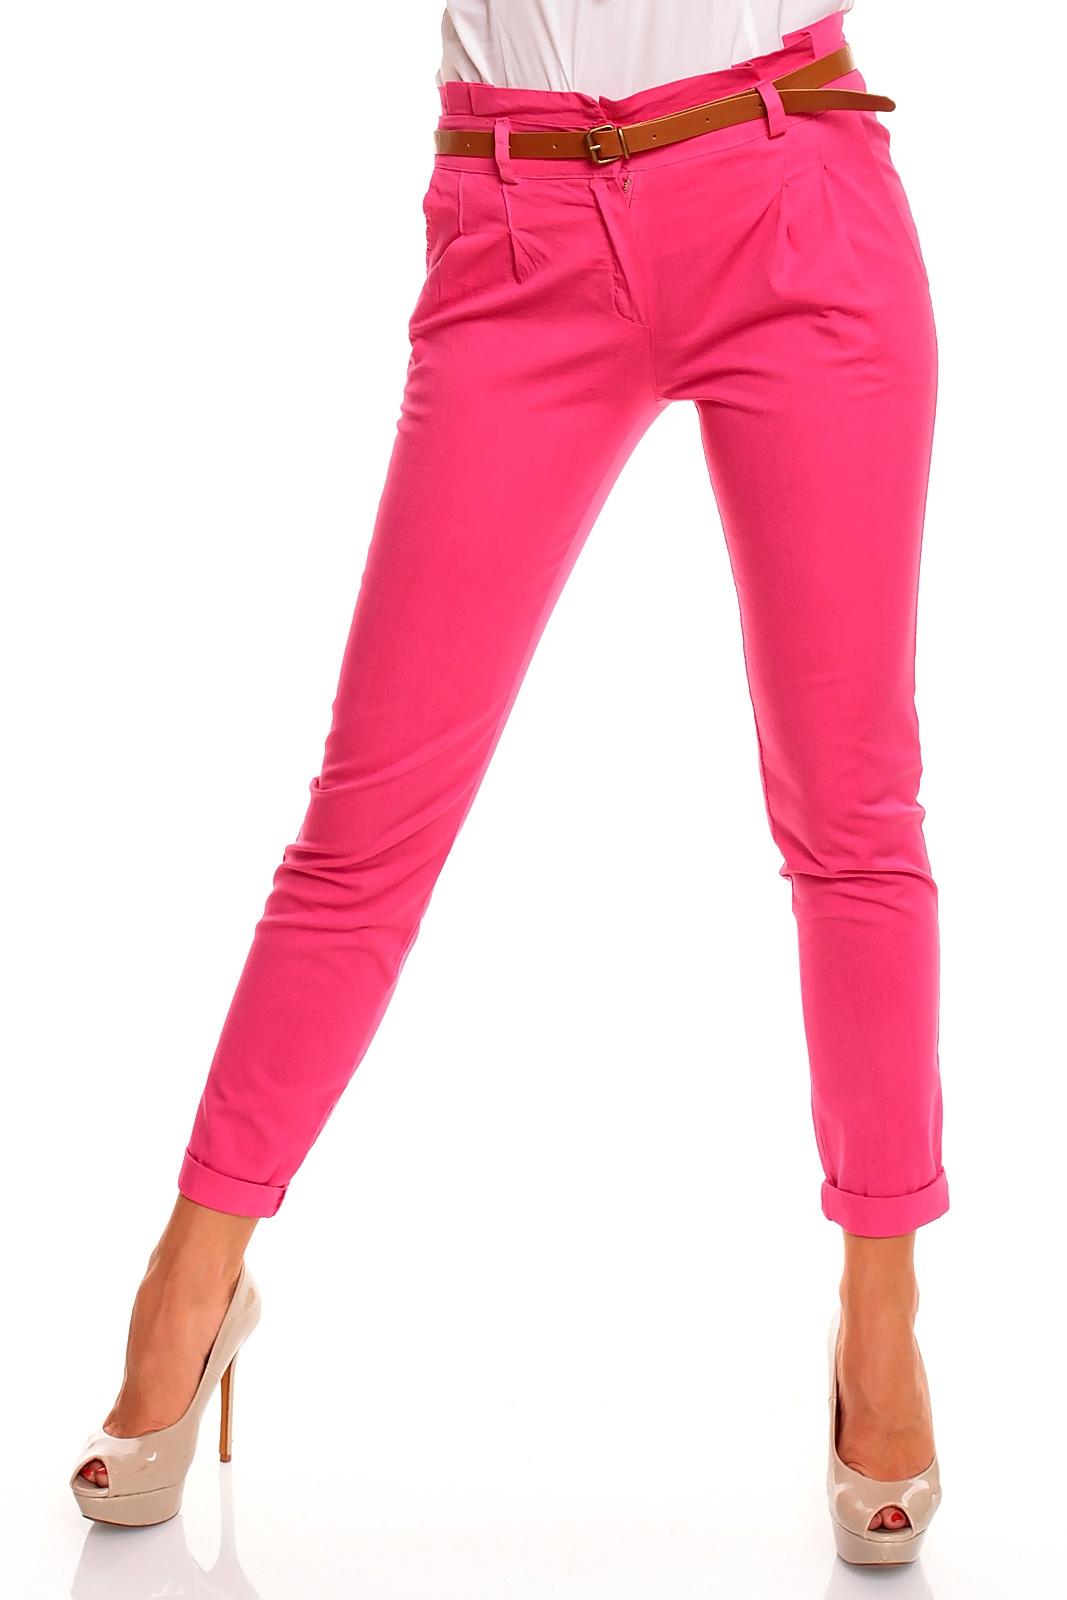 damen chino hose stoffhose jeans freizeithose 9 farben. Black Bedroom Furniture Sets. Home Design Ideas